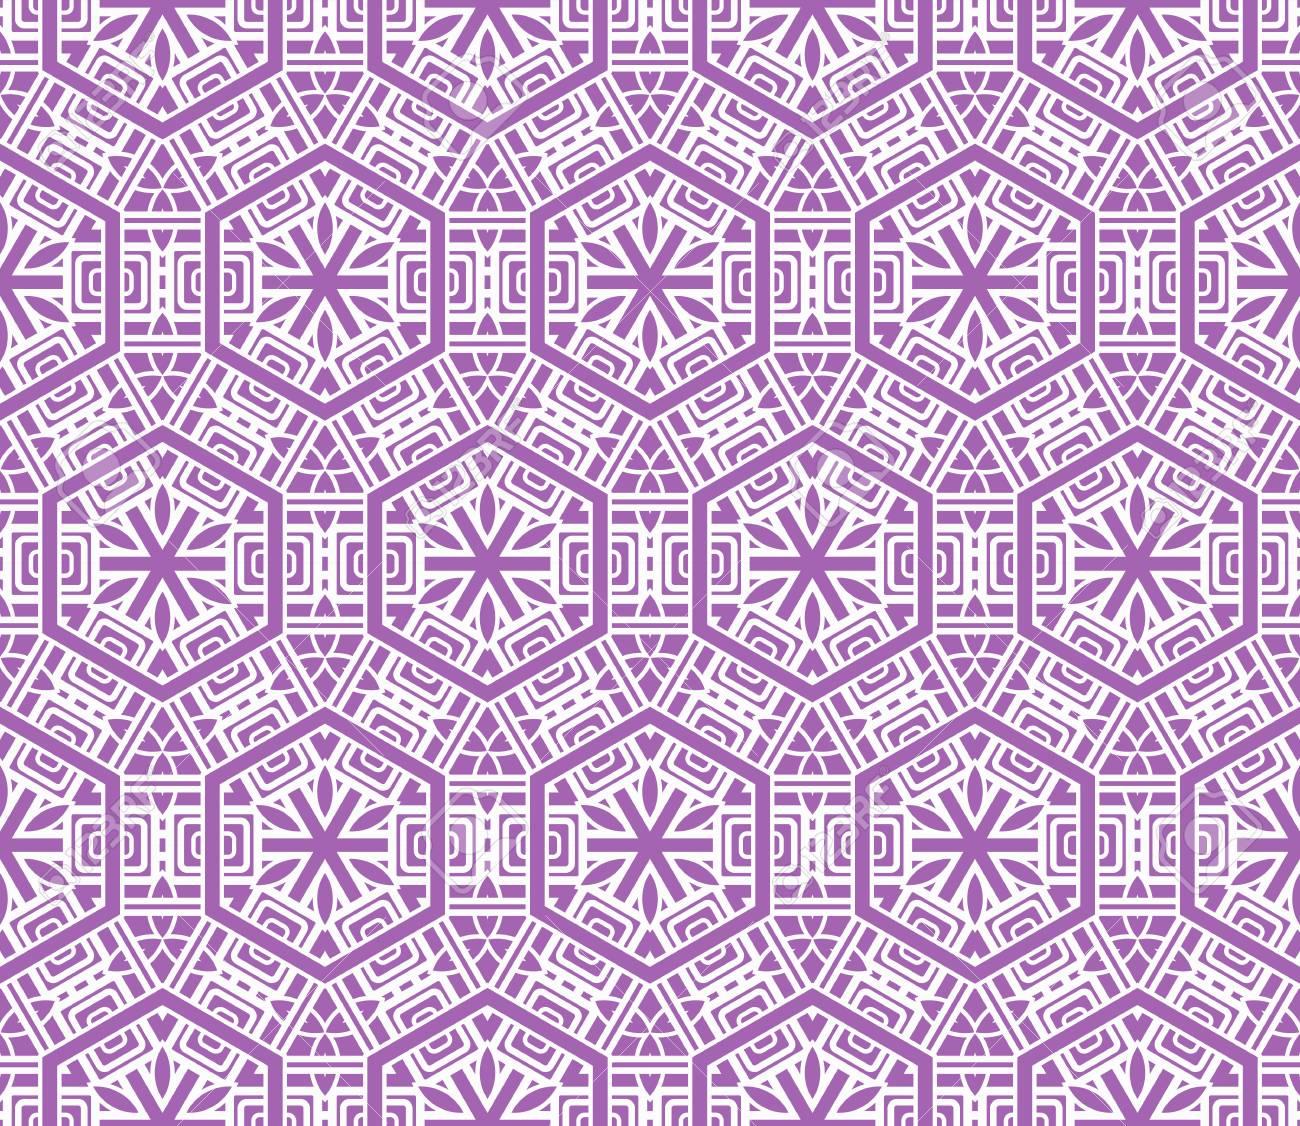 vector illustration. new modern geometric pattern. seamless design for scrapbooking, background, interior - 102083566